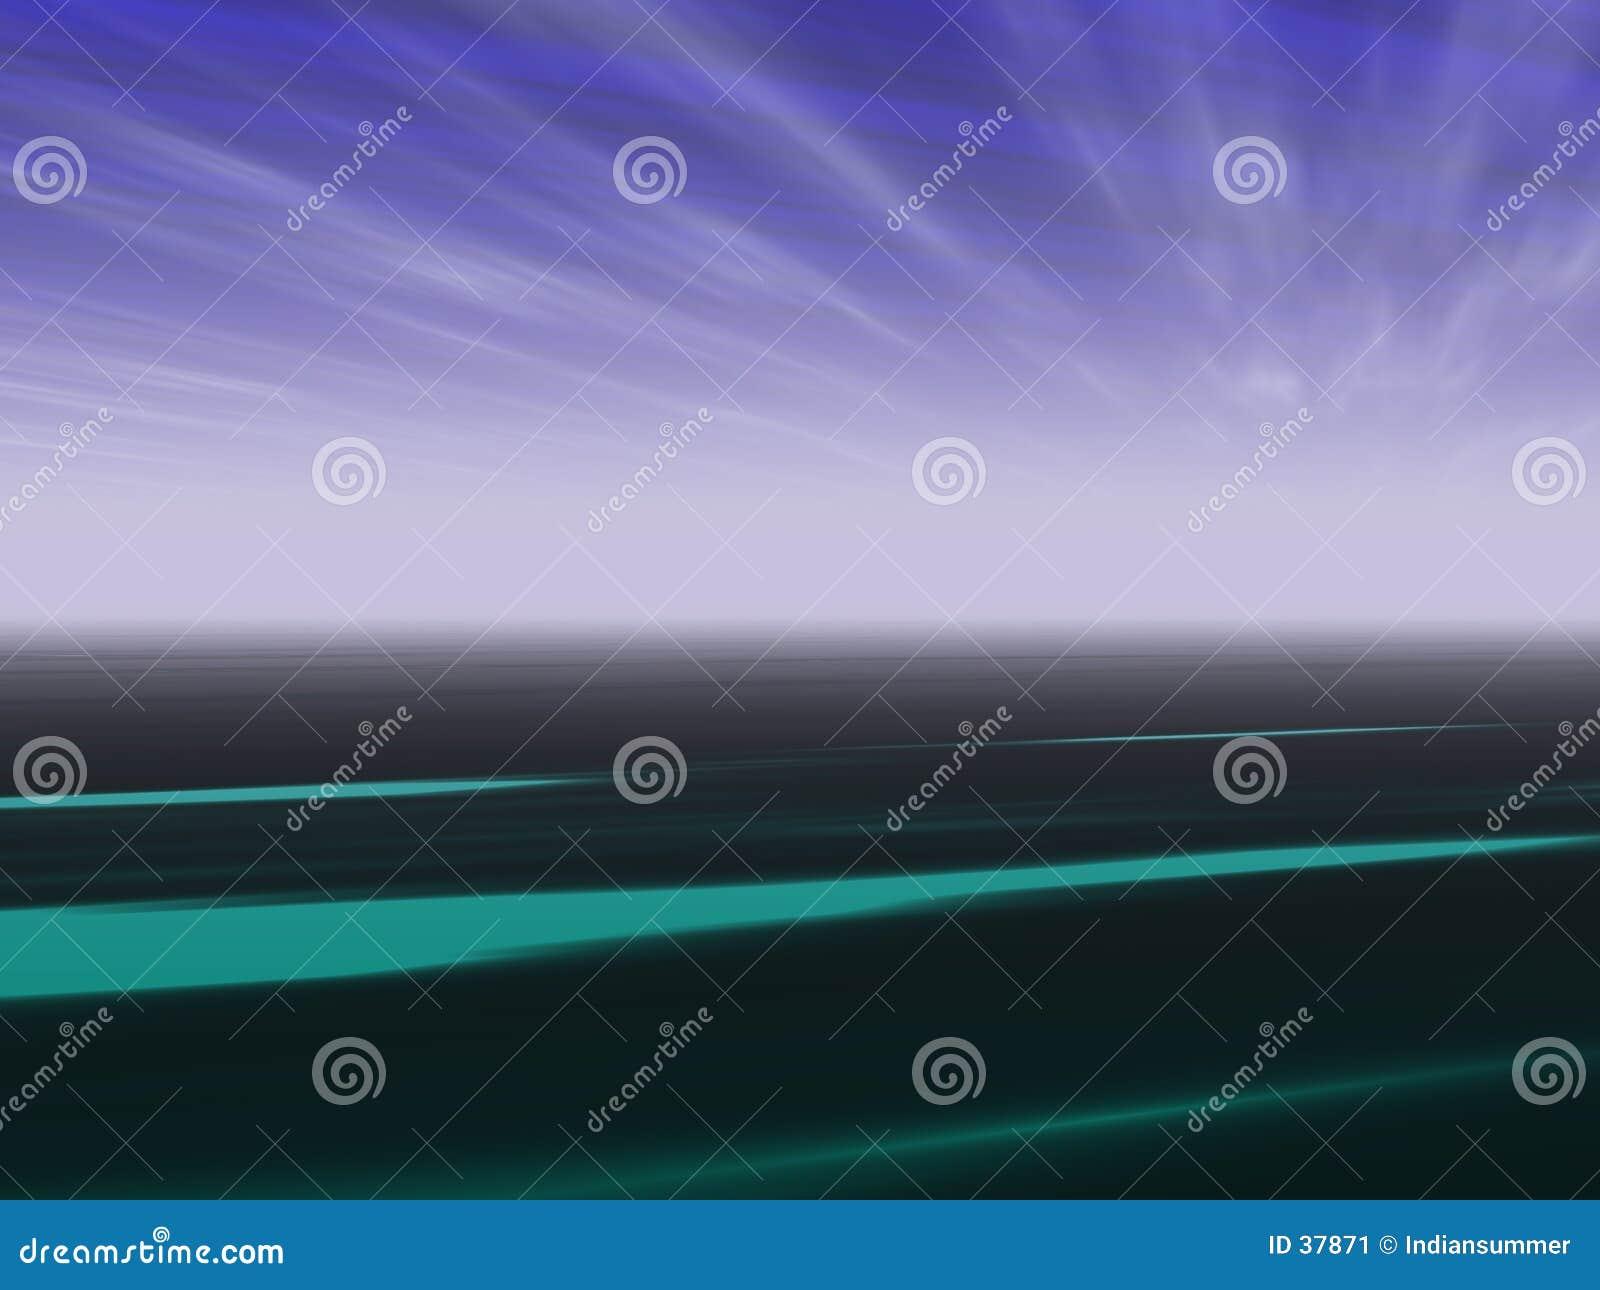 Perspective landscape background